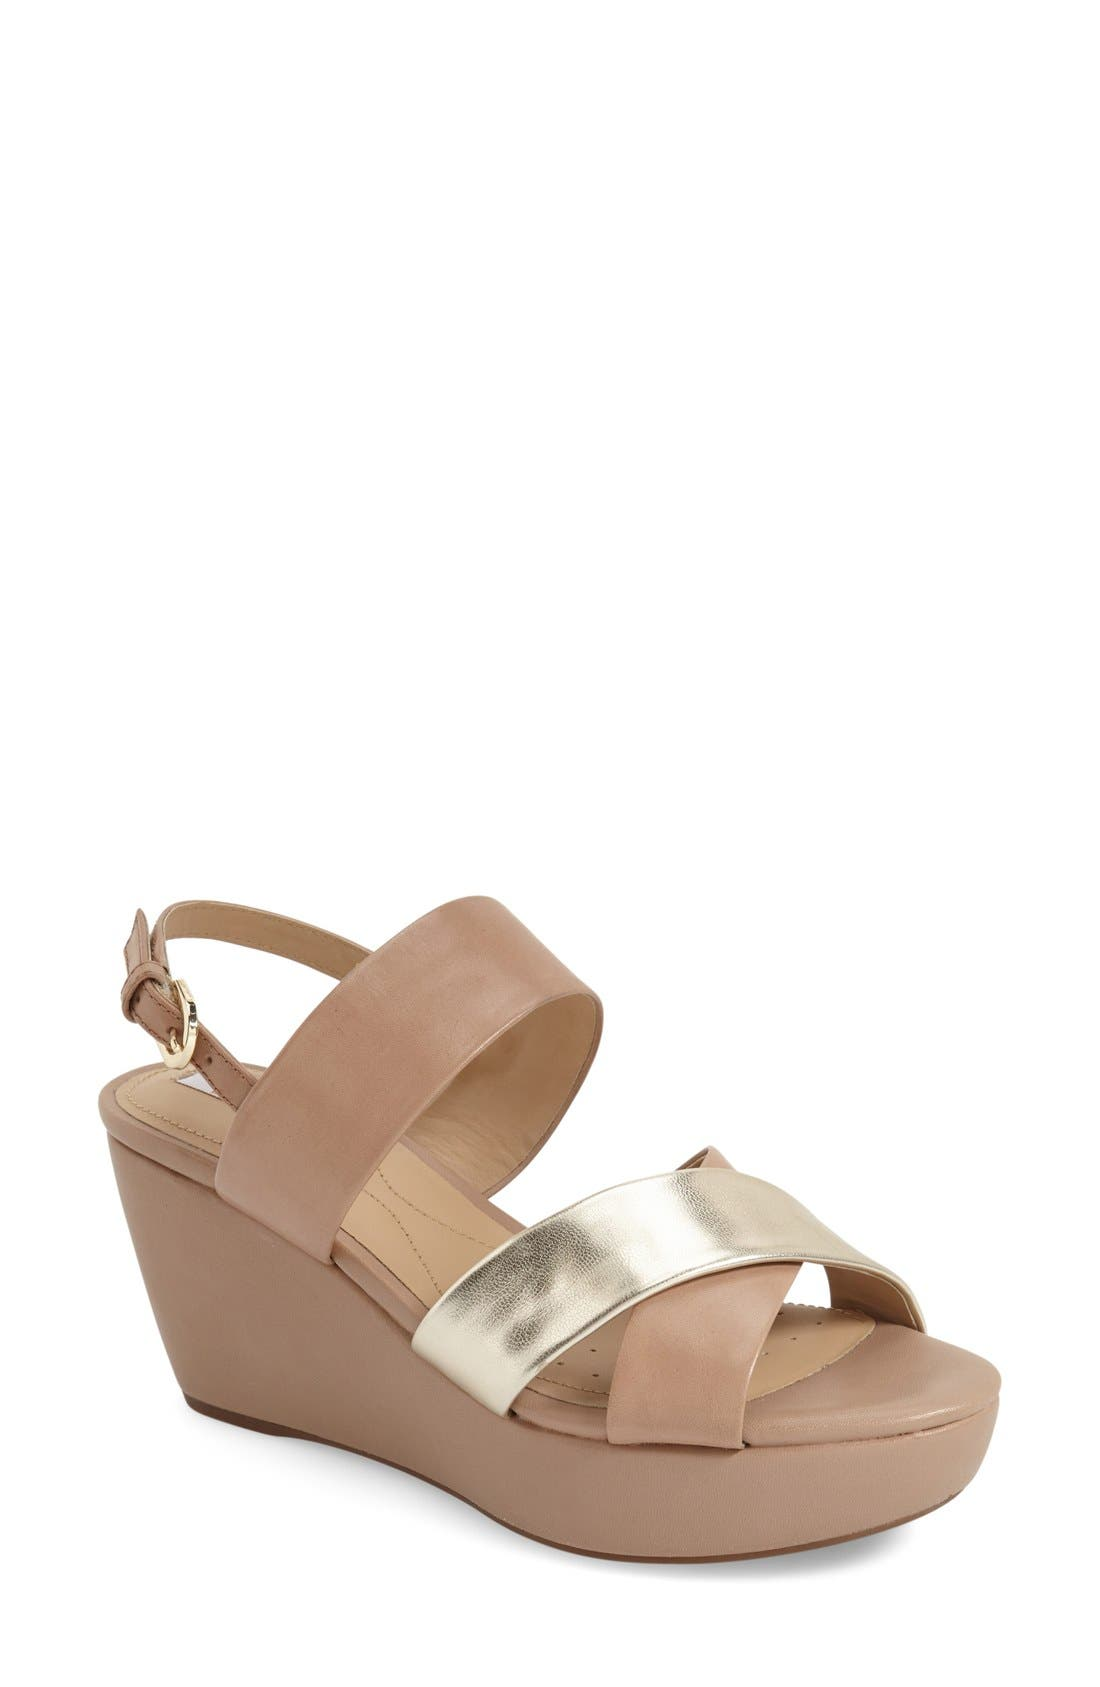 Main Image - Geox 'Thelma' Platform Wedge Sandal (Women)